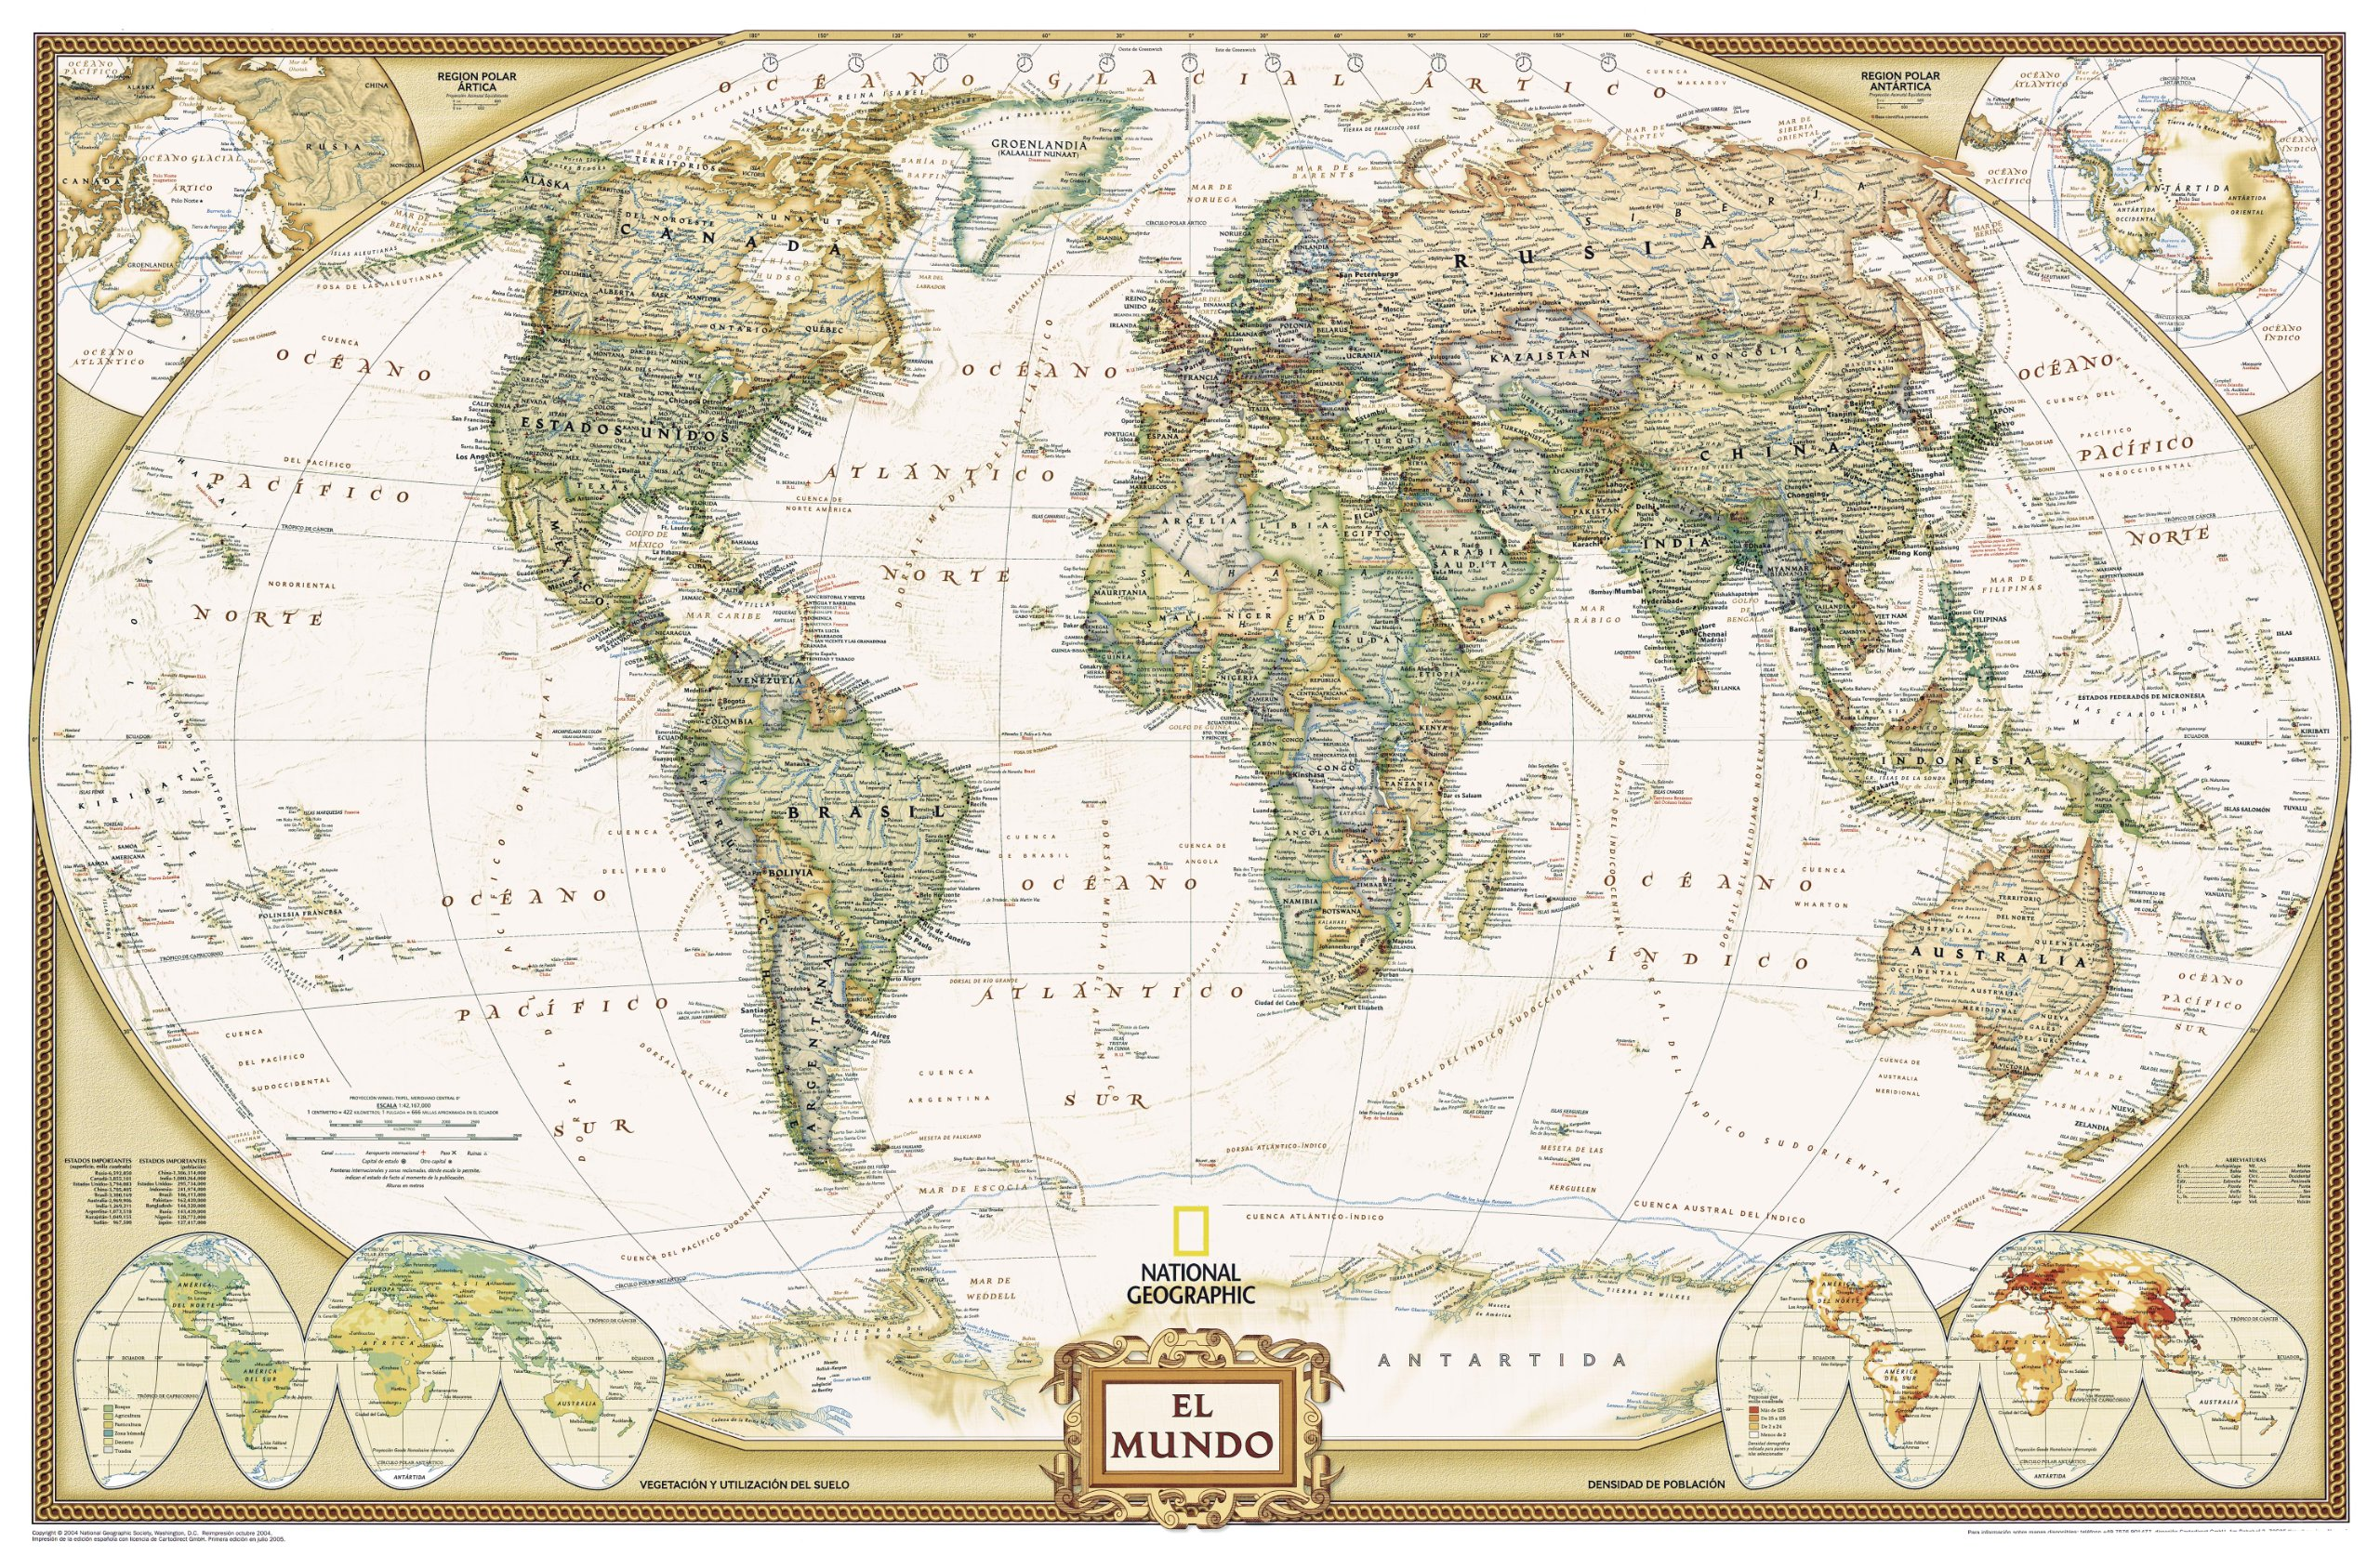 Spanish Speaking World Map.World Executive Spanish Language Edition Wall Map Tubed Reference